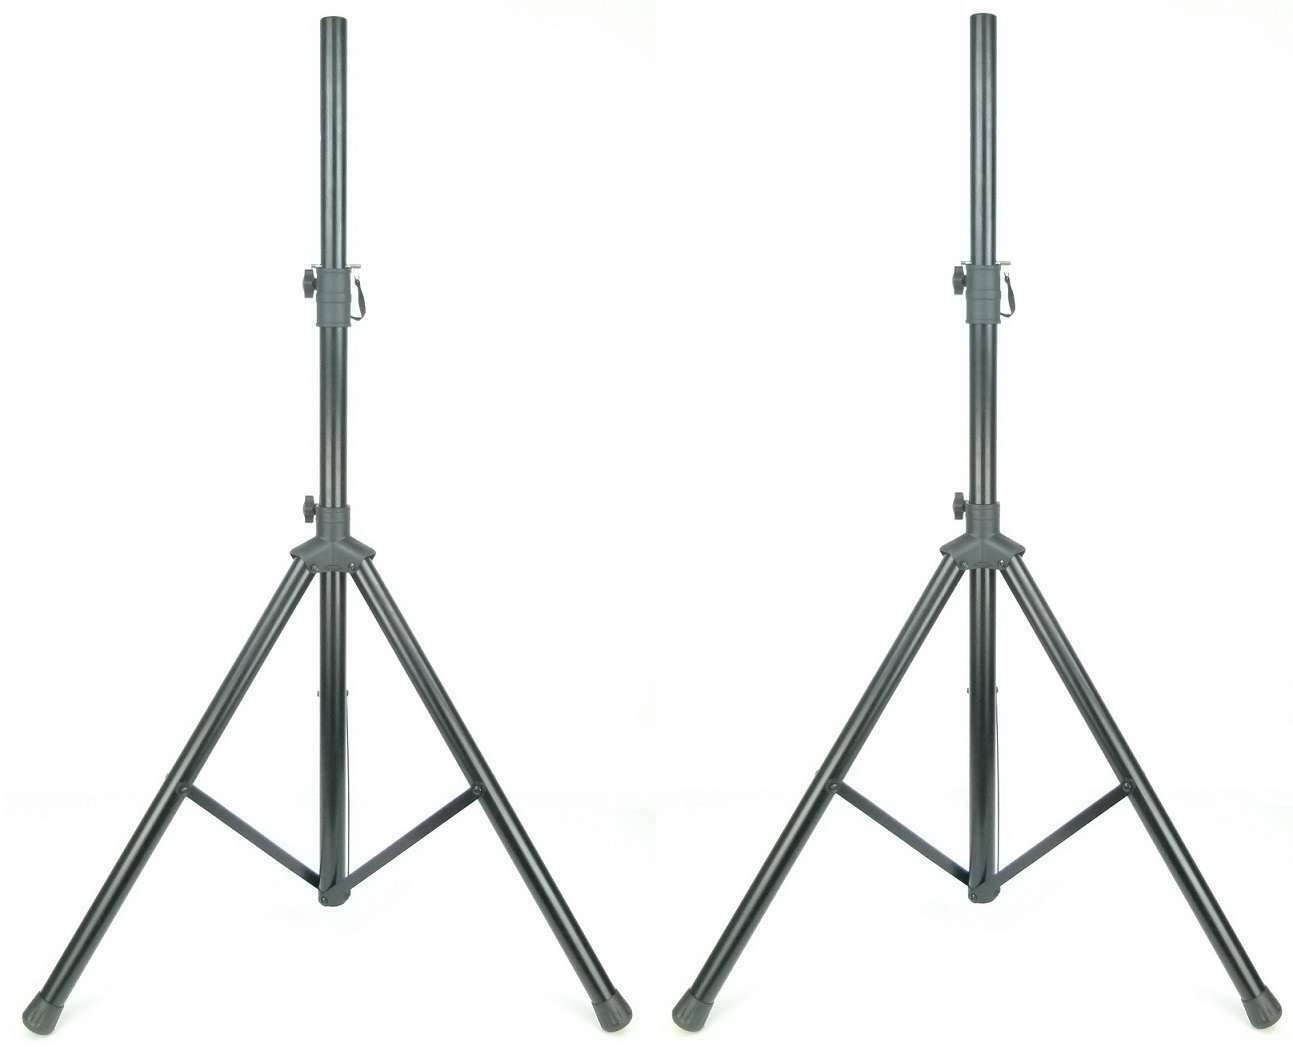 2x DJ PA Speaker Stand Speaker Stand Boxing Tripods Tripods 100